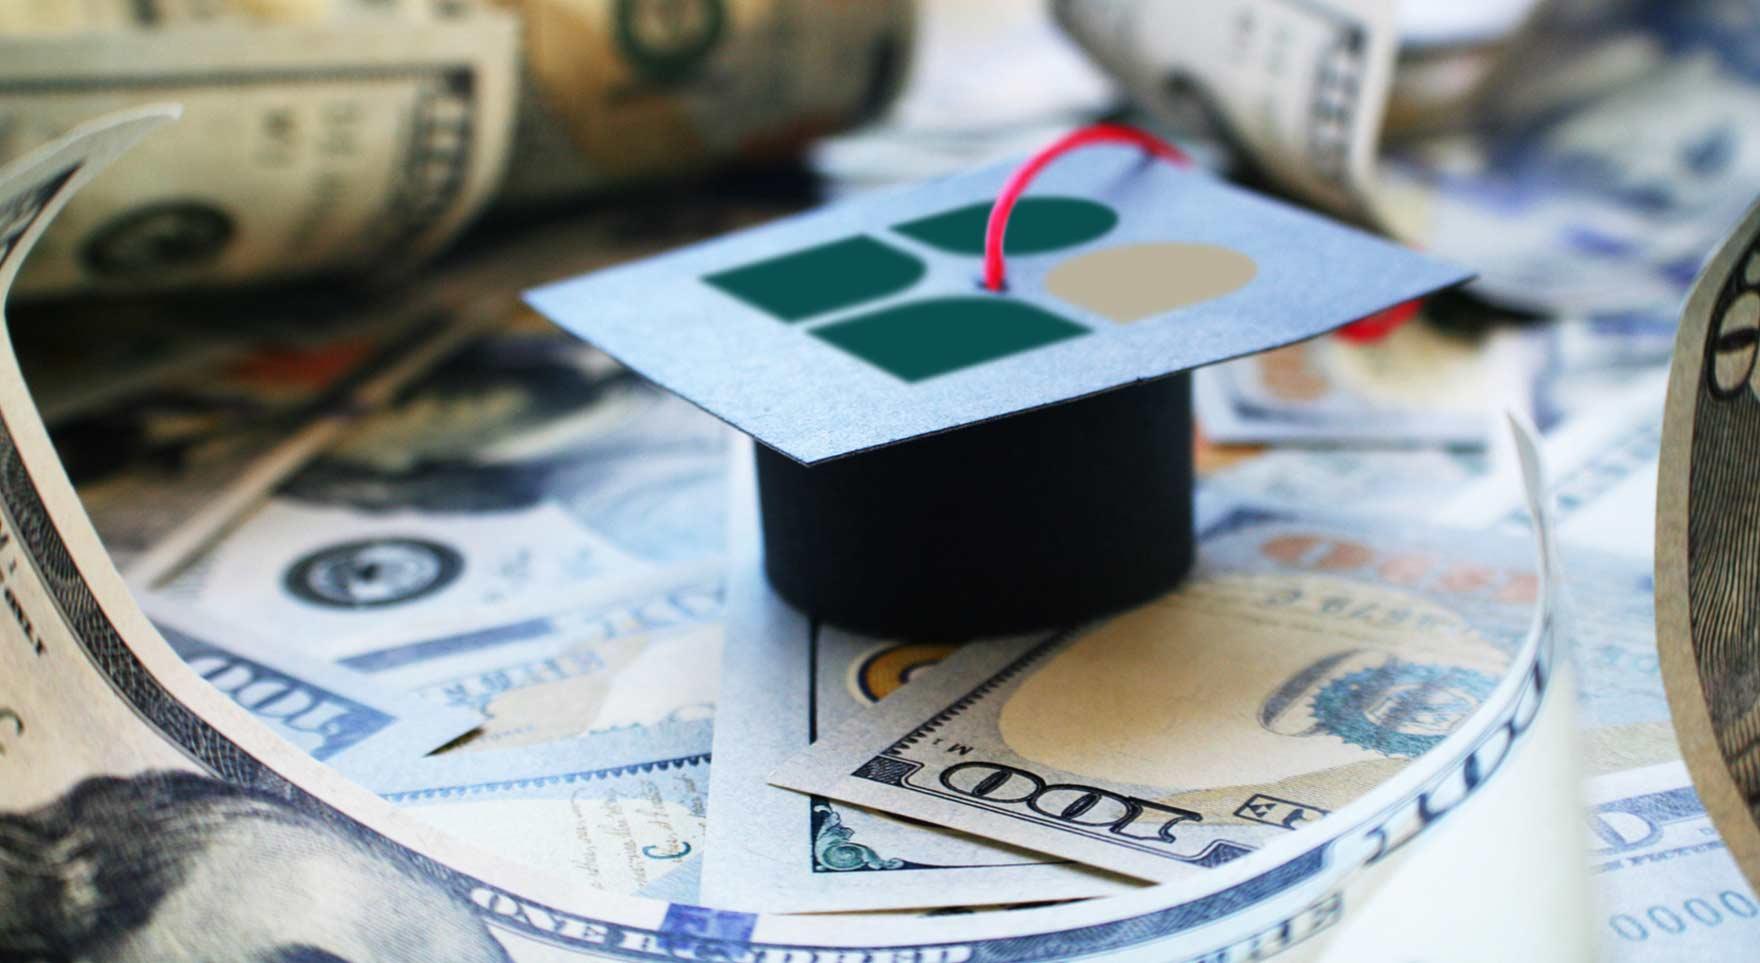 4 Ways to Get Student Debt Under Control